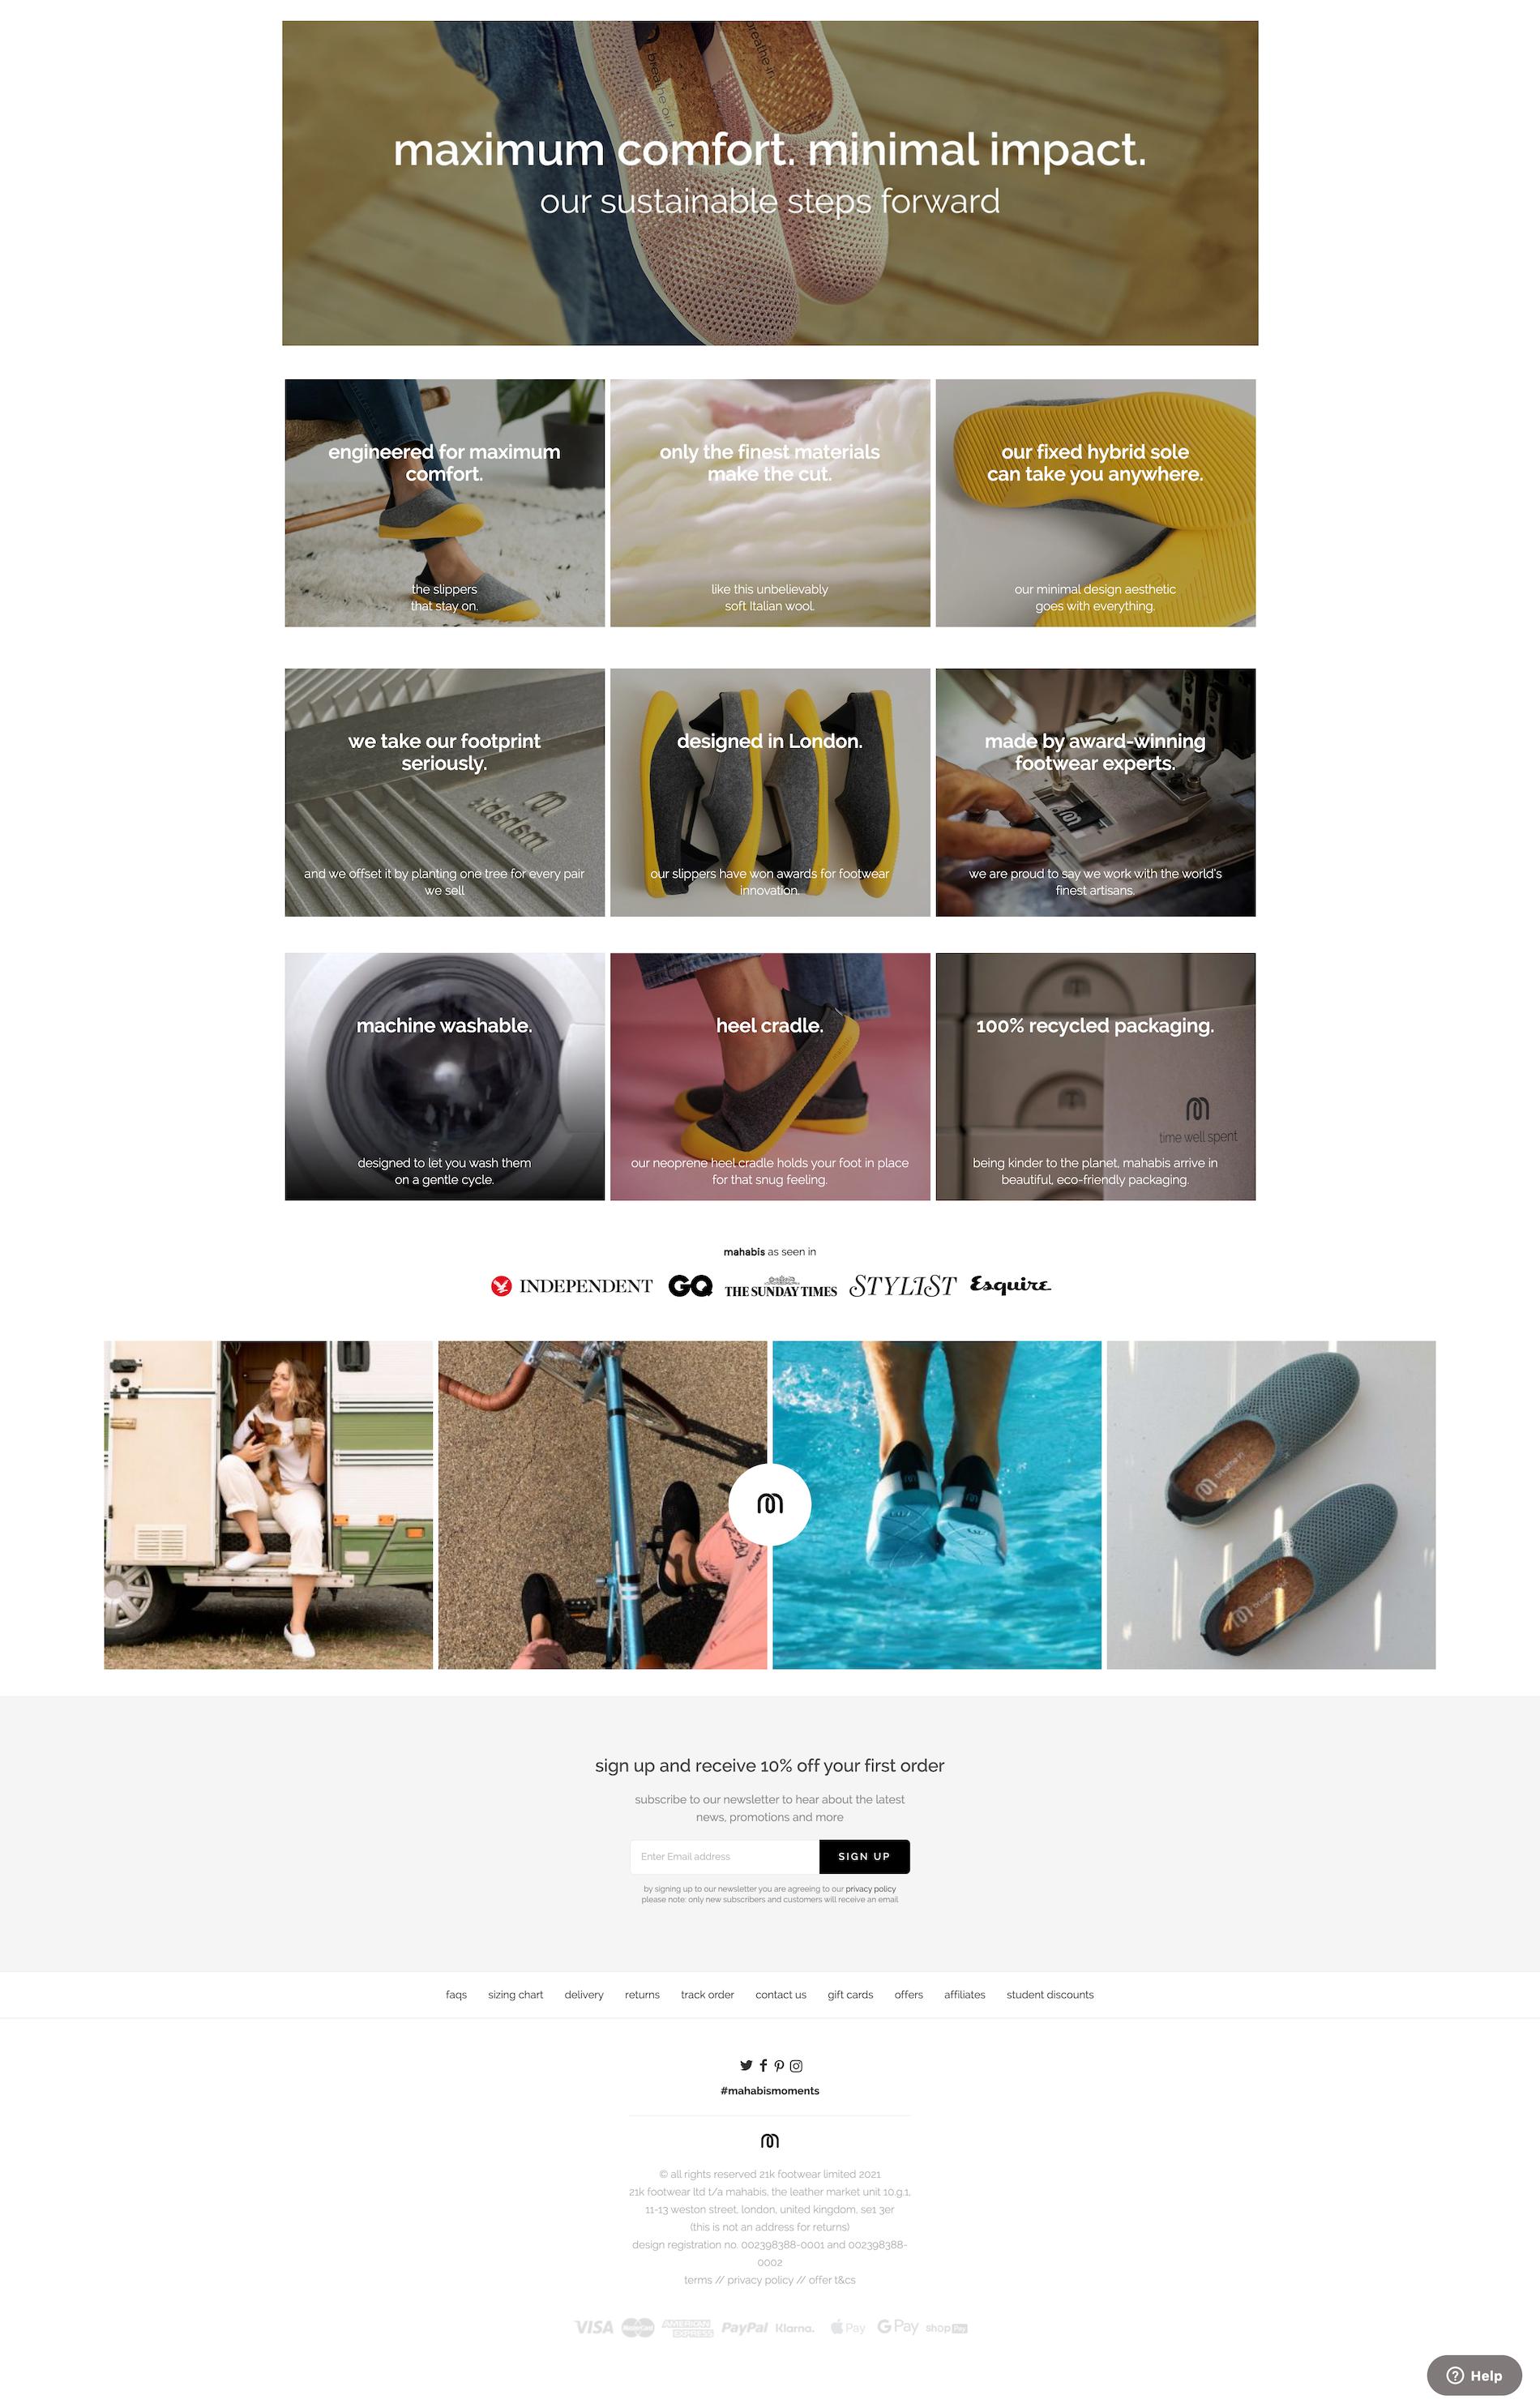 mahabis homepage bottom half cta images